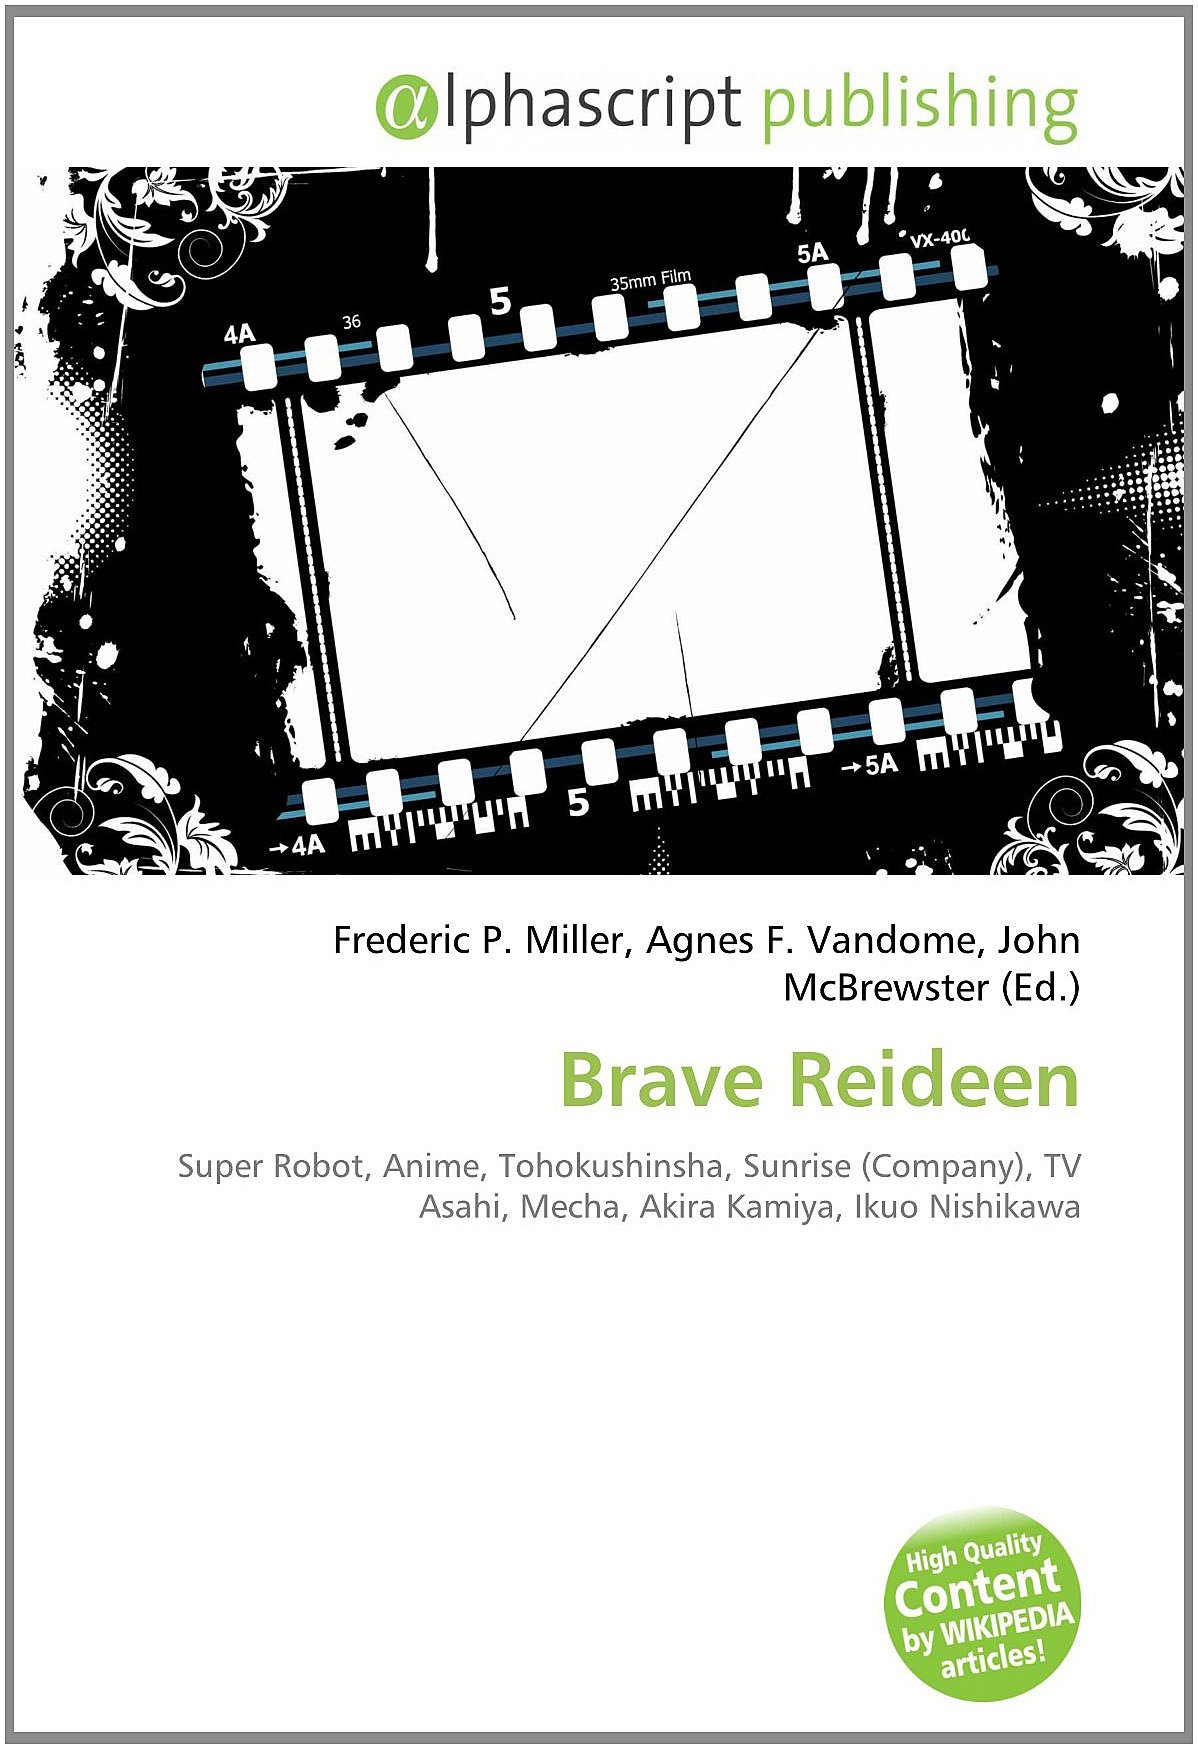 Brave Reideen: Super Robot, Anime, Tohokushinsha, Sunrise Company , TV Asahi, Mecha, Akira Kamiya, Ikuo Nishikawa: Amazon.es: Miller, Frederic P, Vandome, Agnes F, McBrewster, John: Libros en idiomas extranjeros